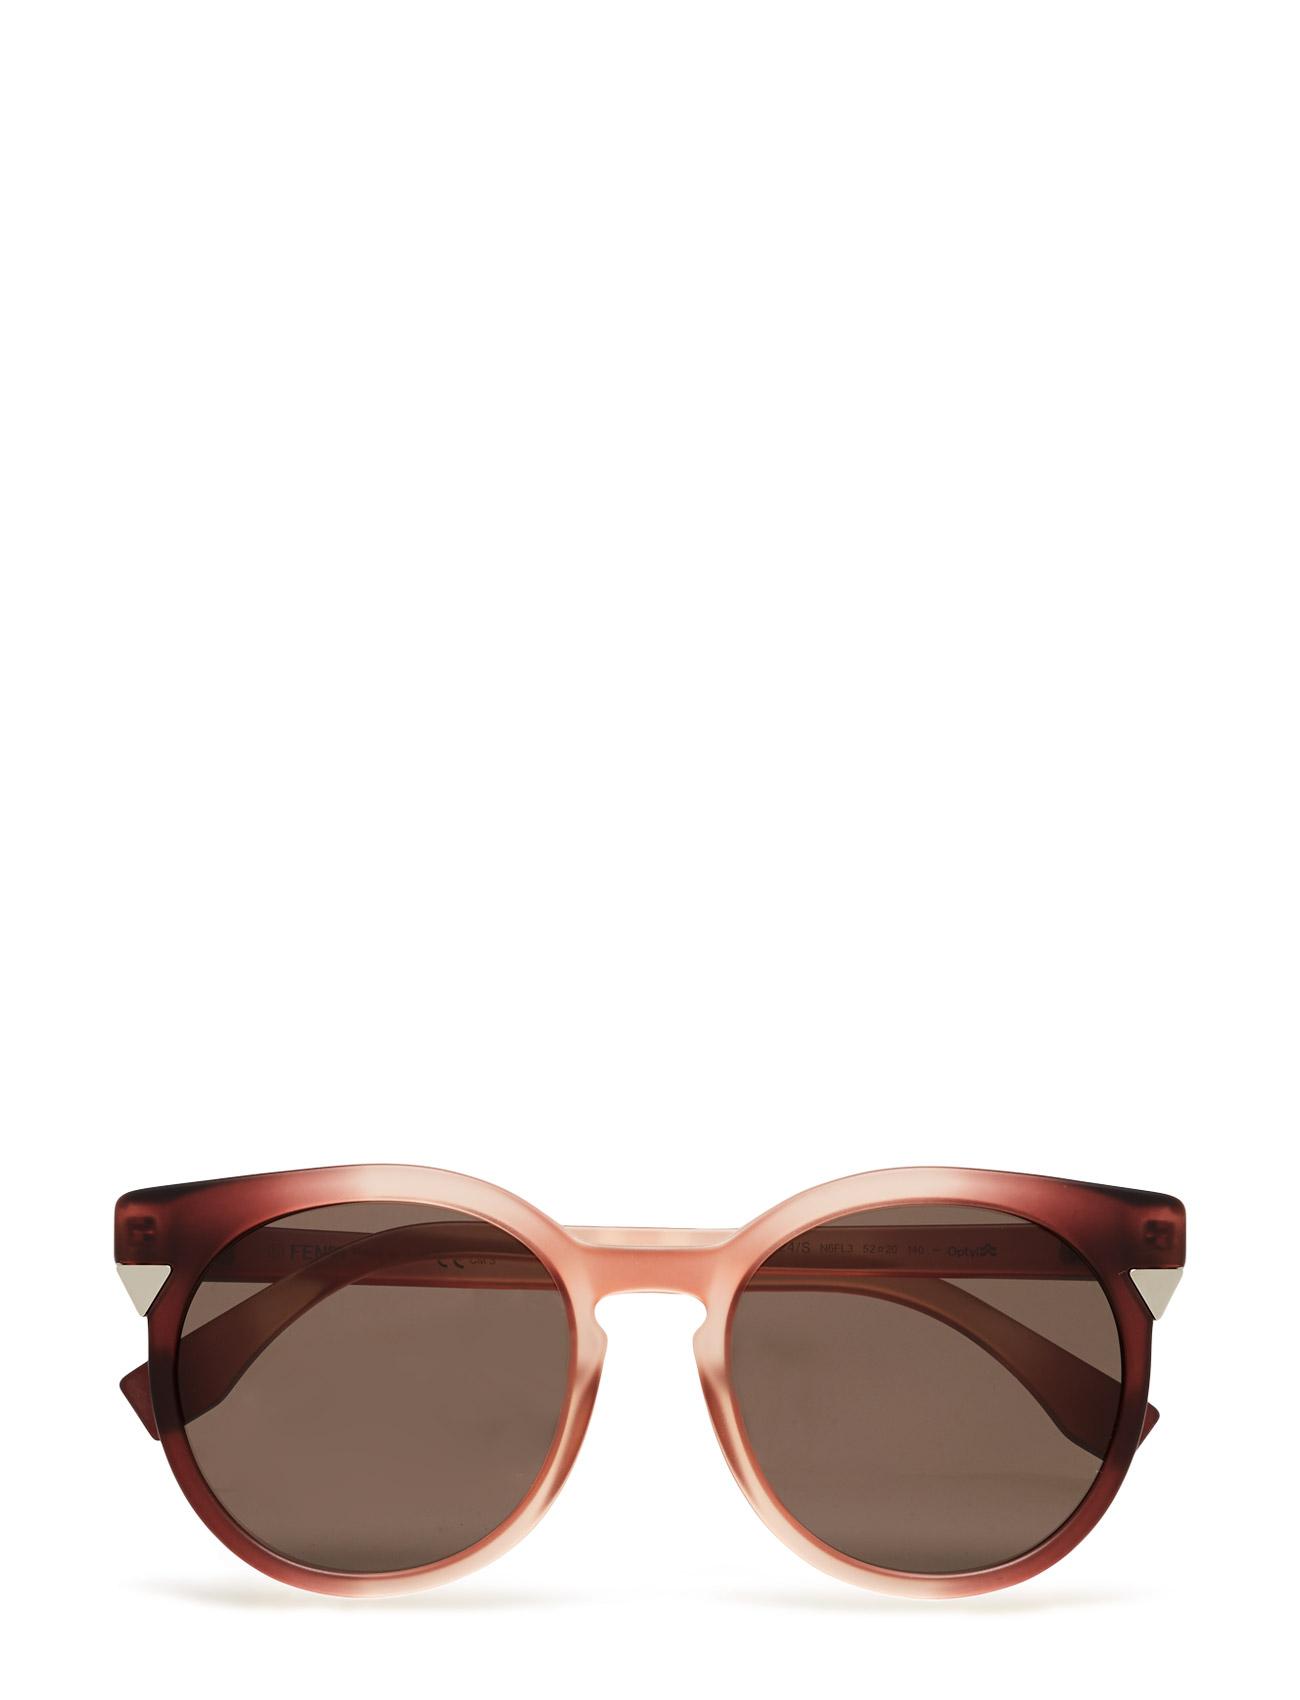 fendi sunglasses – 230367 på boozt.com dk